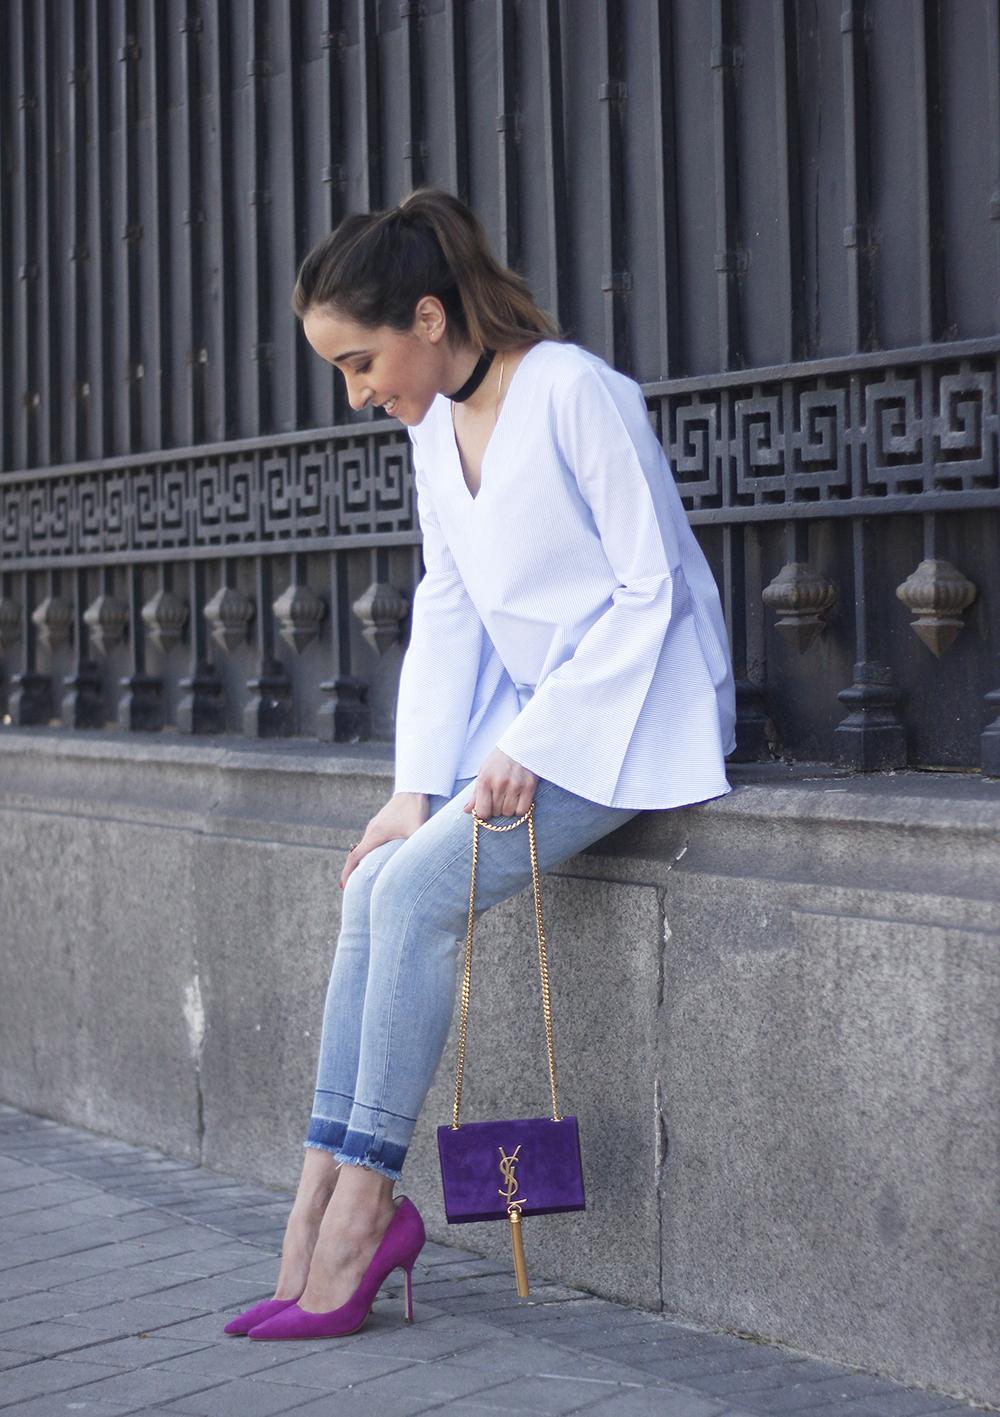 striped blouse with bell sleeves ysl handbag carolina herrena pink heels black choker Aristocrazy Ring outfit10